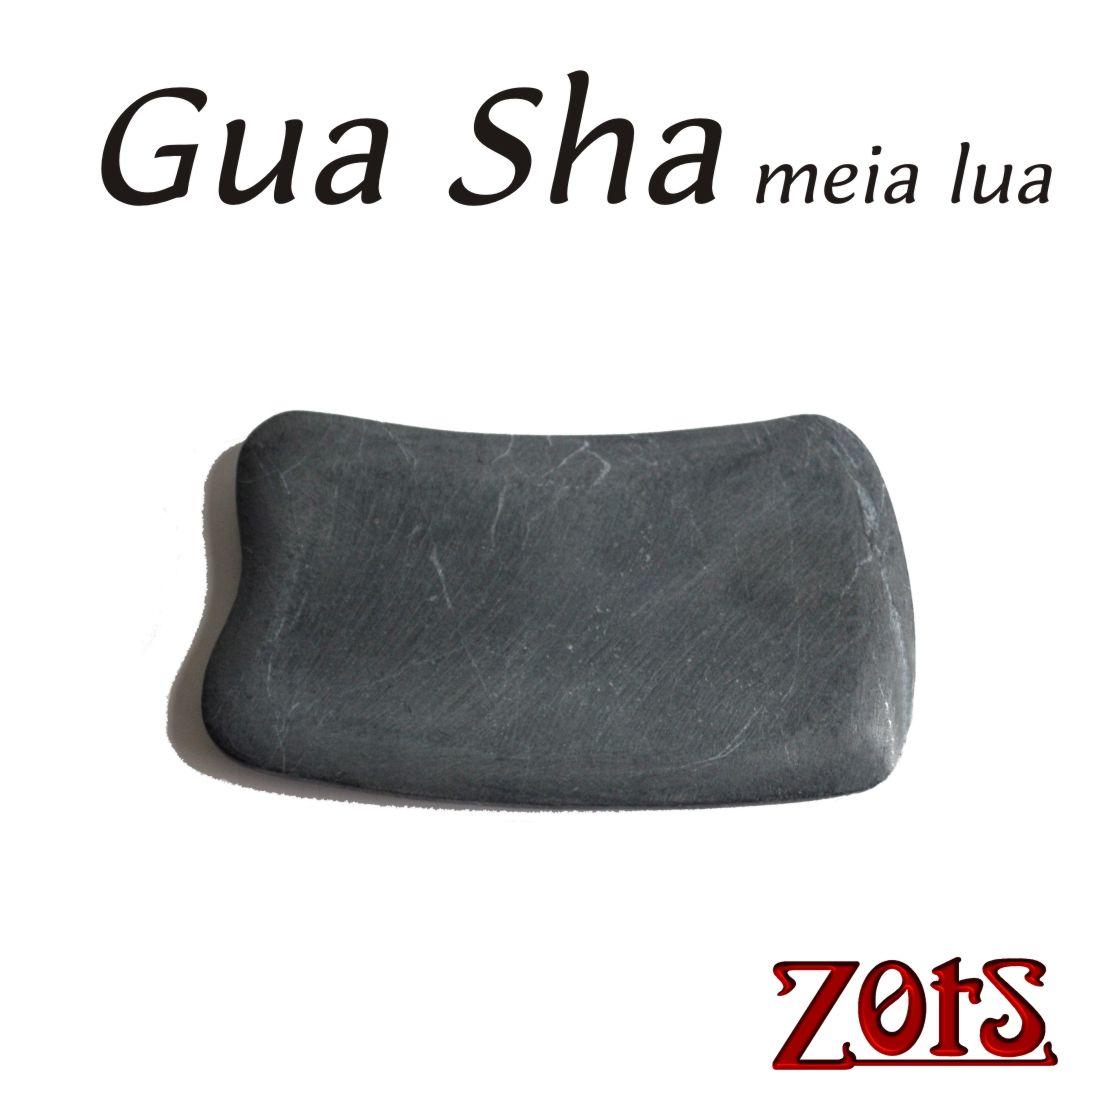 GuaShá meia lua Basalto  -  Zots